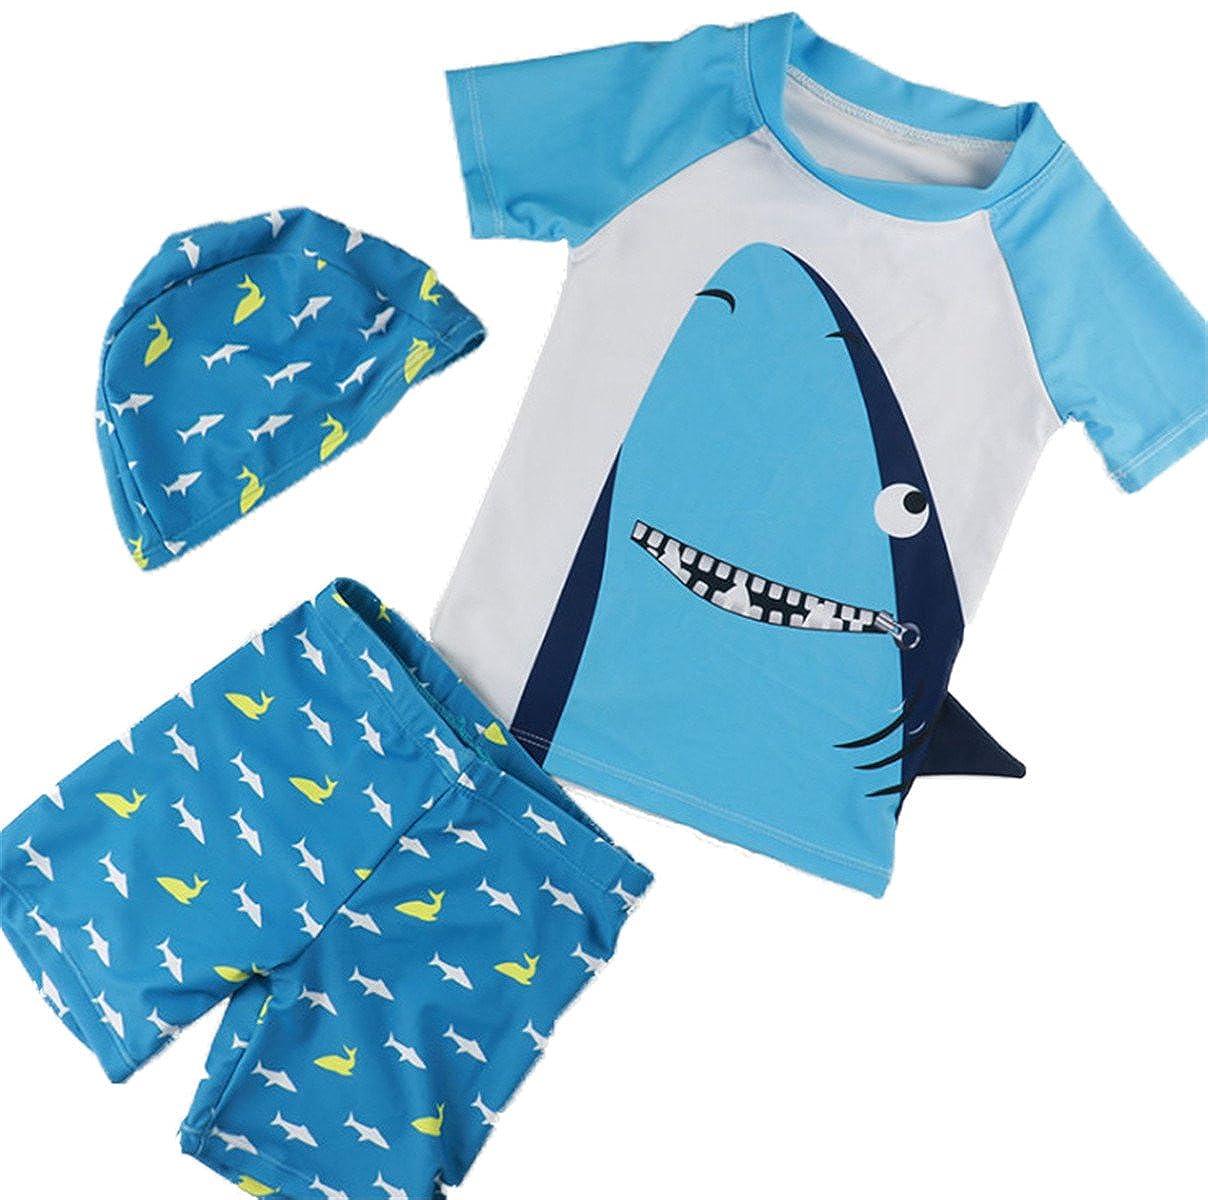 REWANGOING Baby Kids Boys Two Pieces Cartoon Print Short Sleeve Swimwear Rash Guard UPF 50+ UV Swimsuit with Caps klstD051